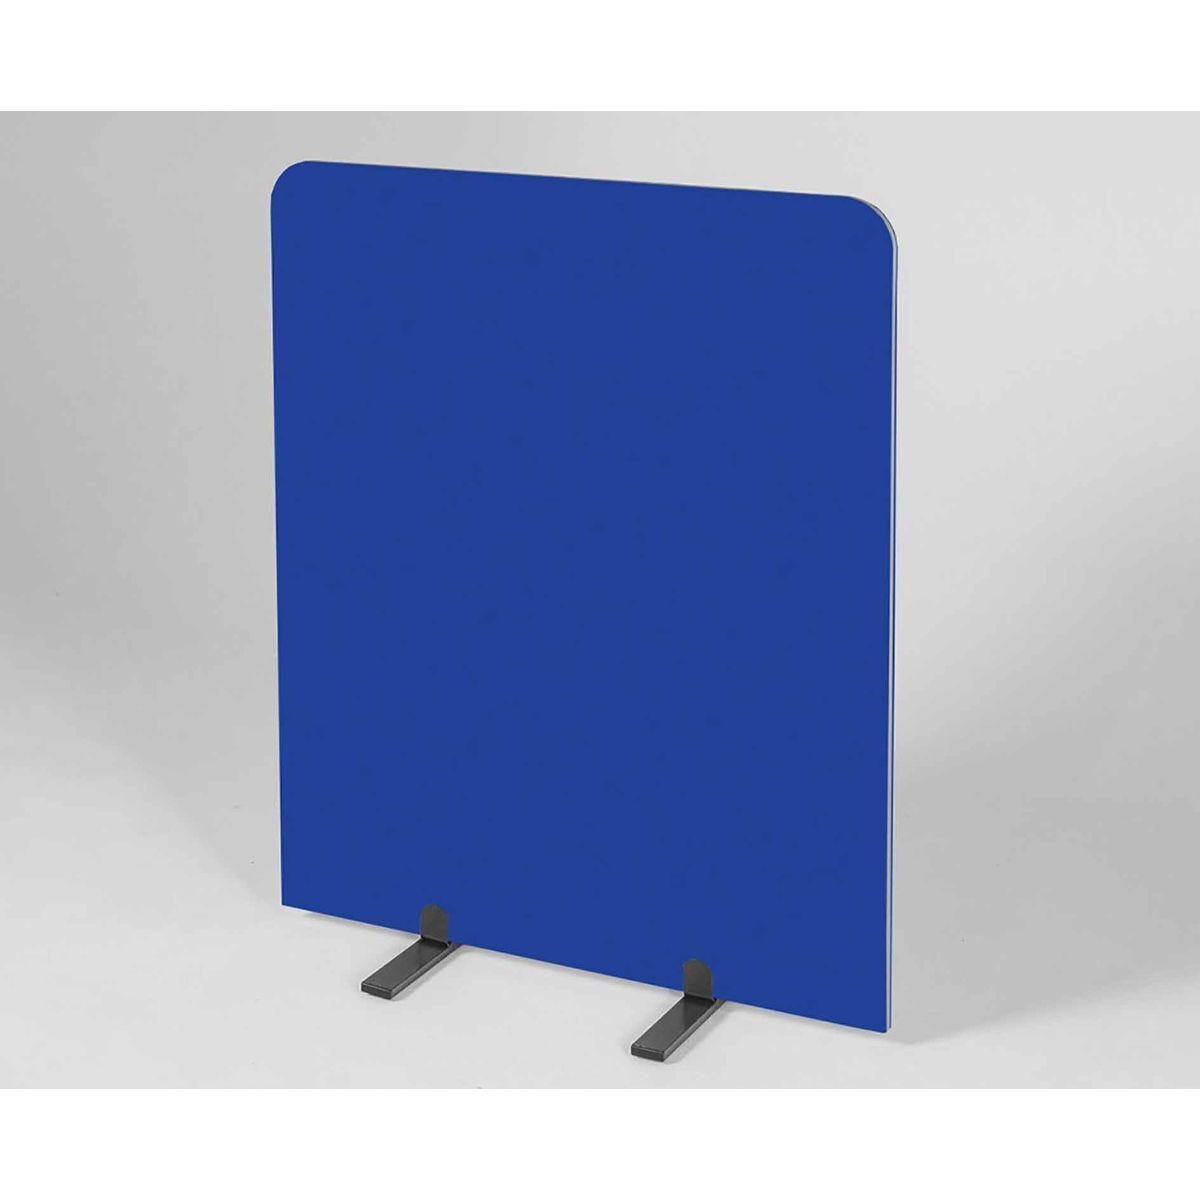 Metroplan BusyScreen Curve Screen 1600 x 1200mm Royal Blue